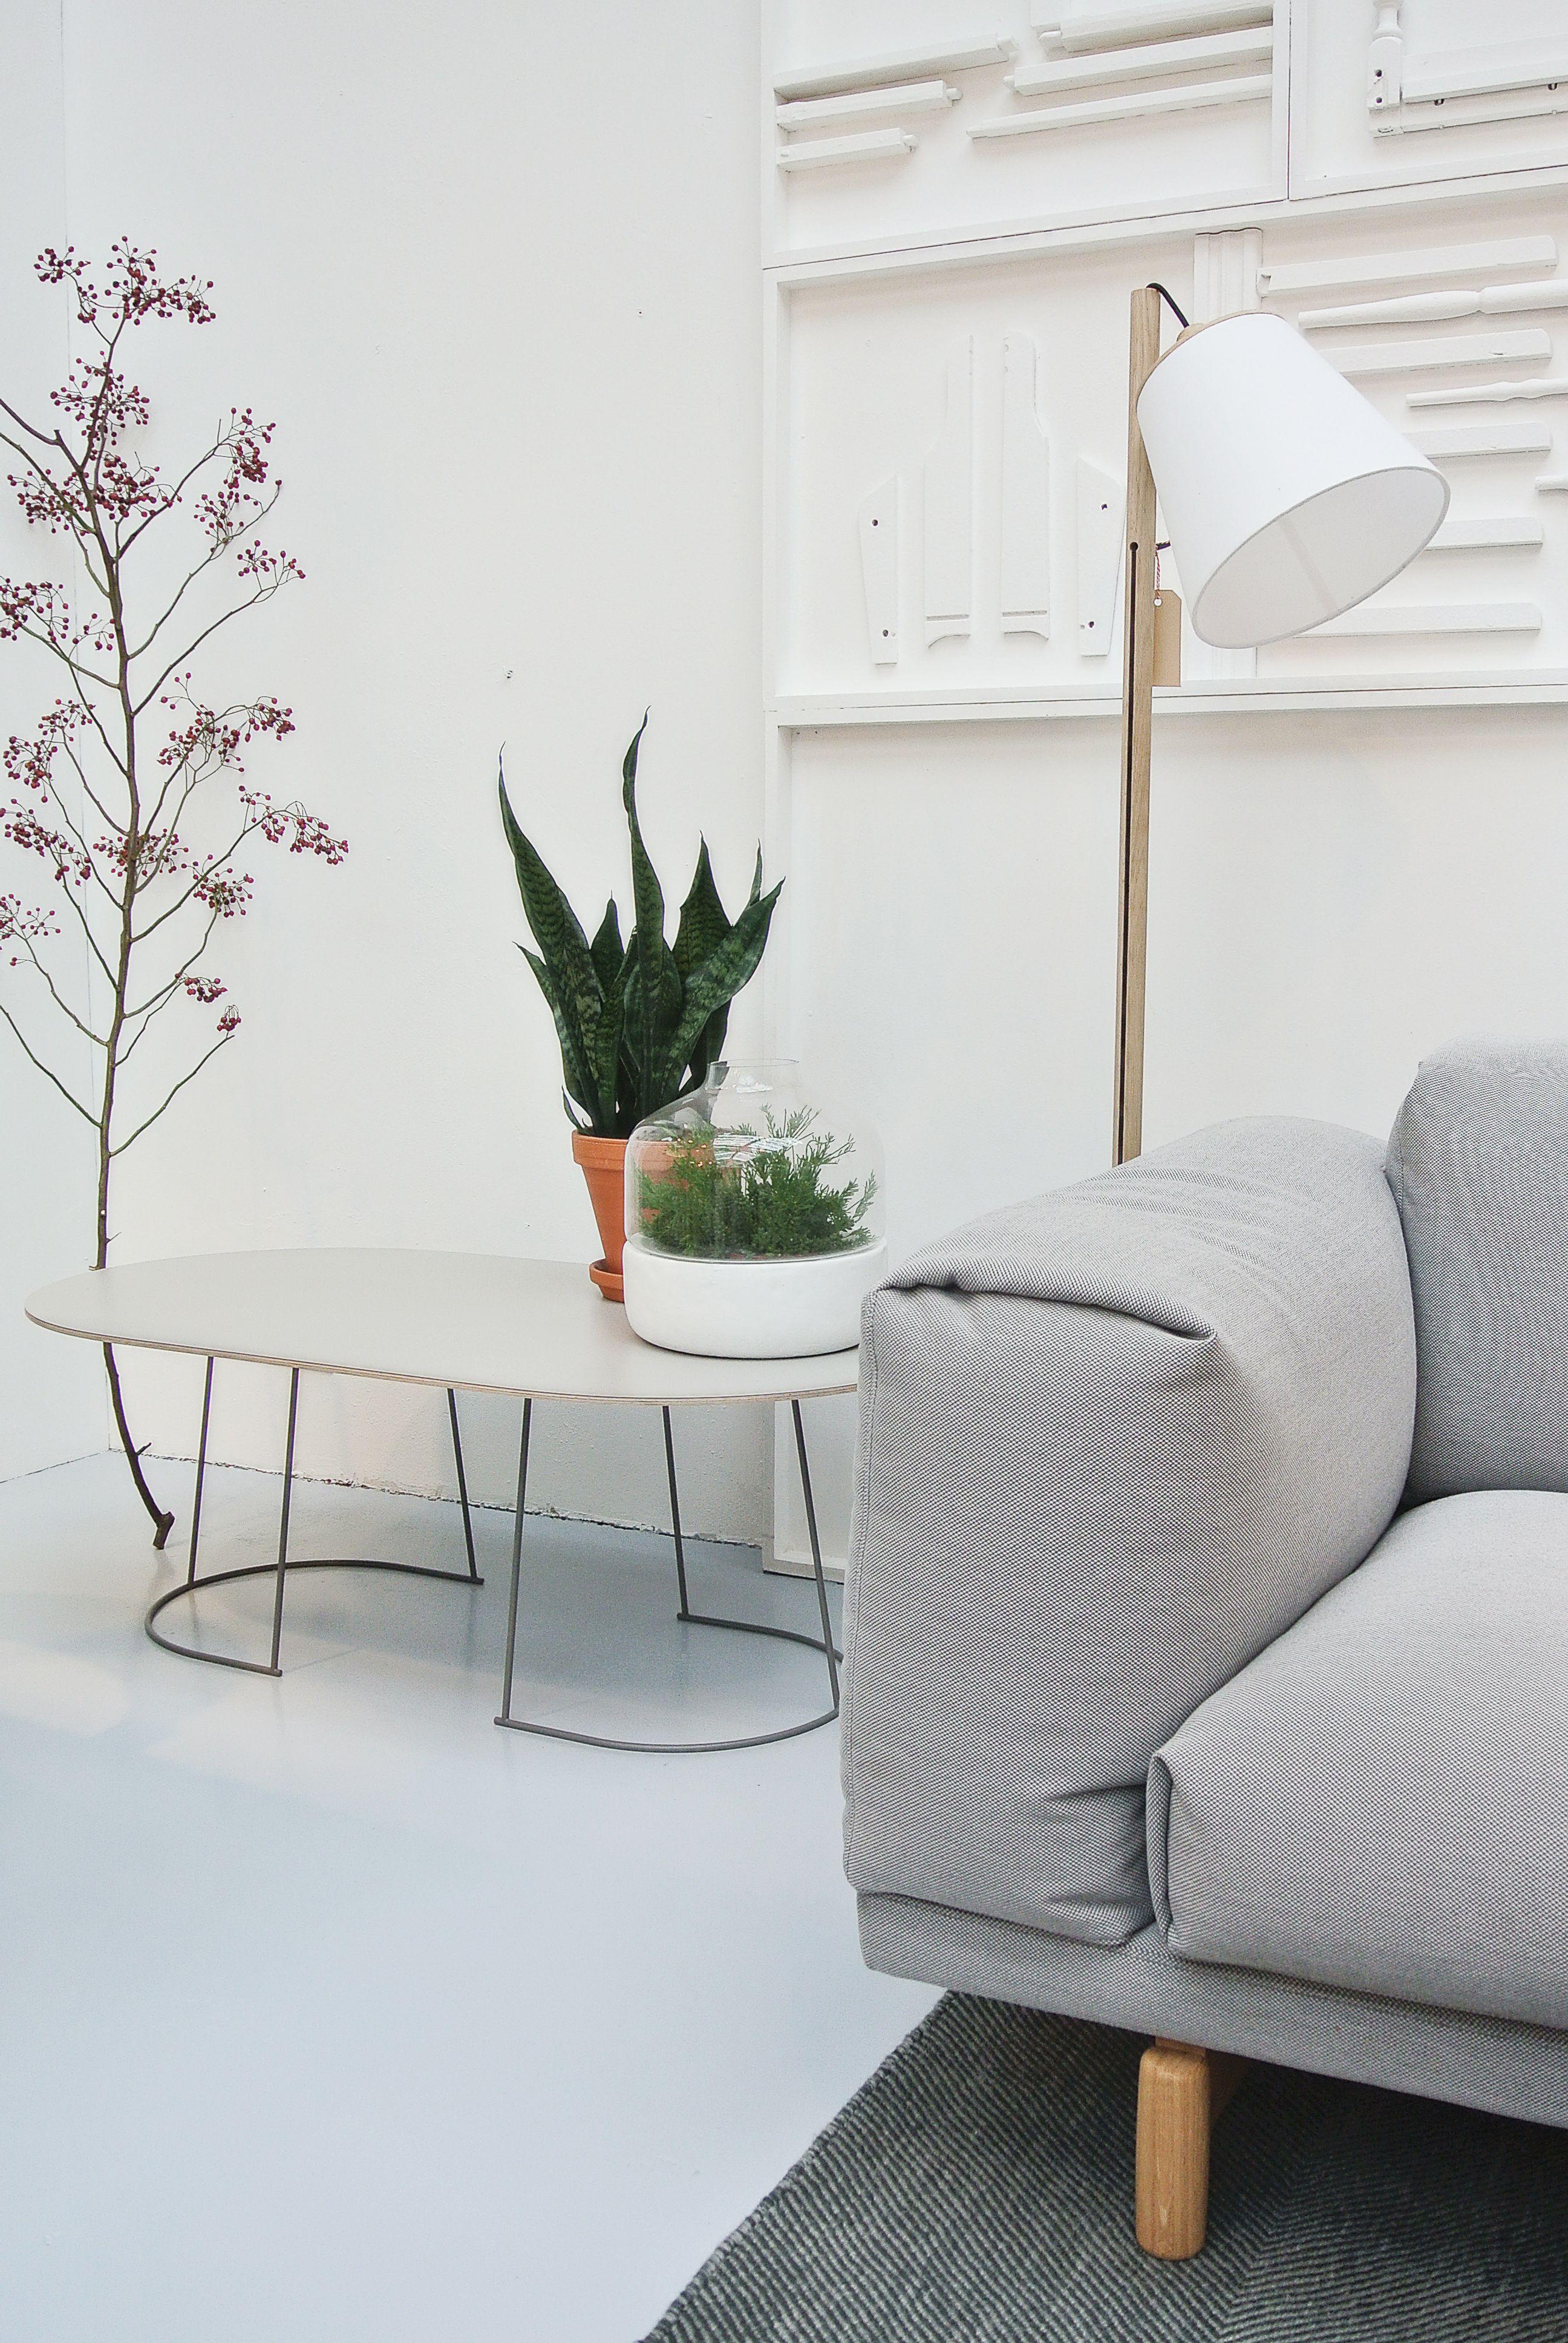 Muuto Rest Sofa kleed Varjo salontafel Airy In de Muuto Brand